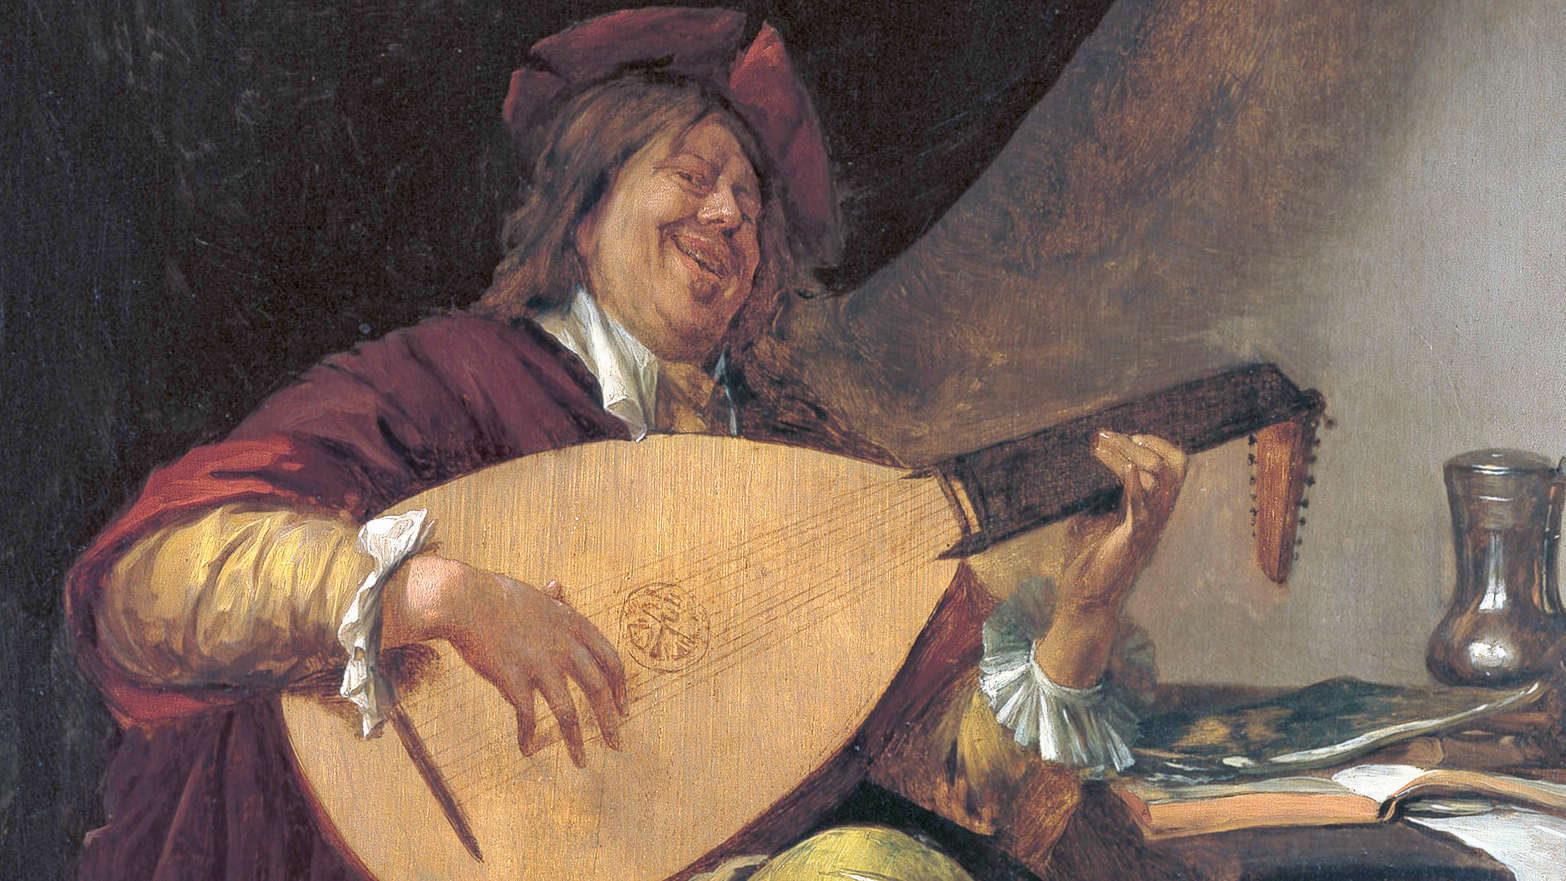 Ян Стен, Автопортрет, III четверть XVII века